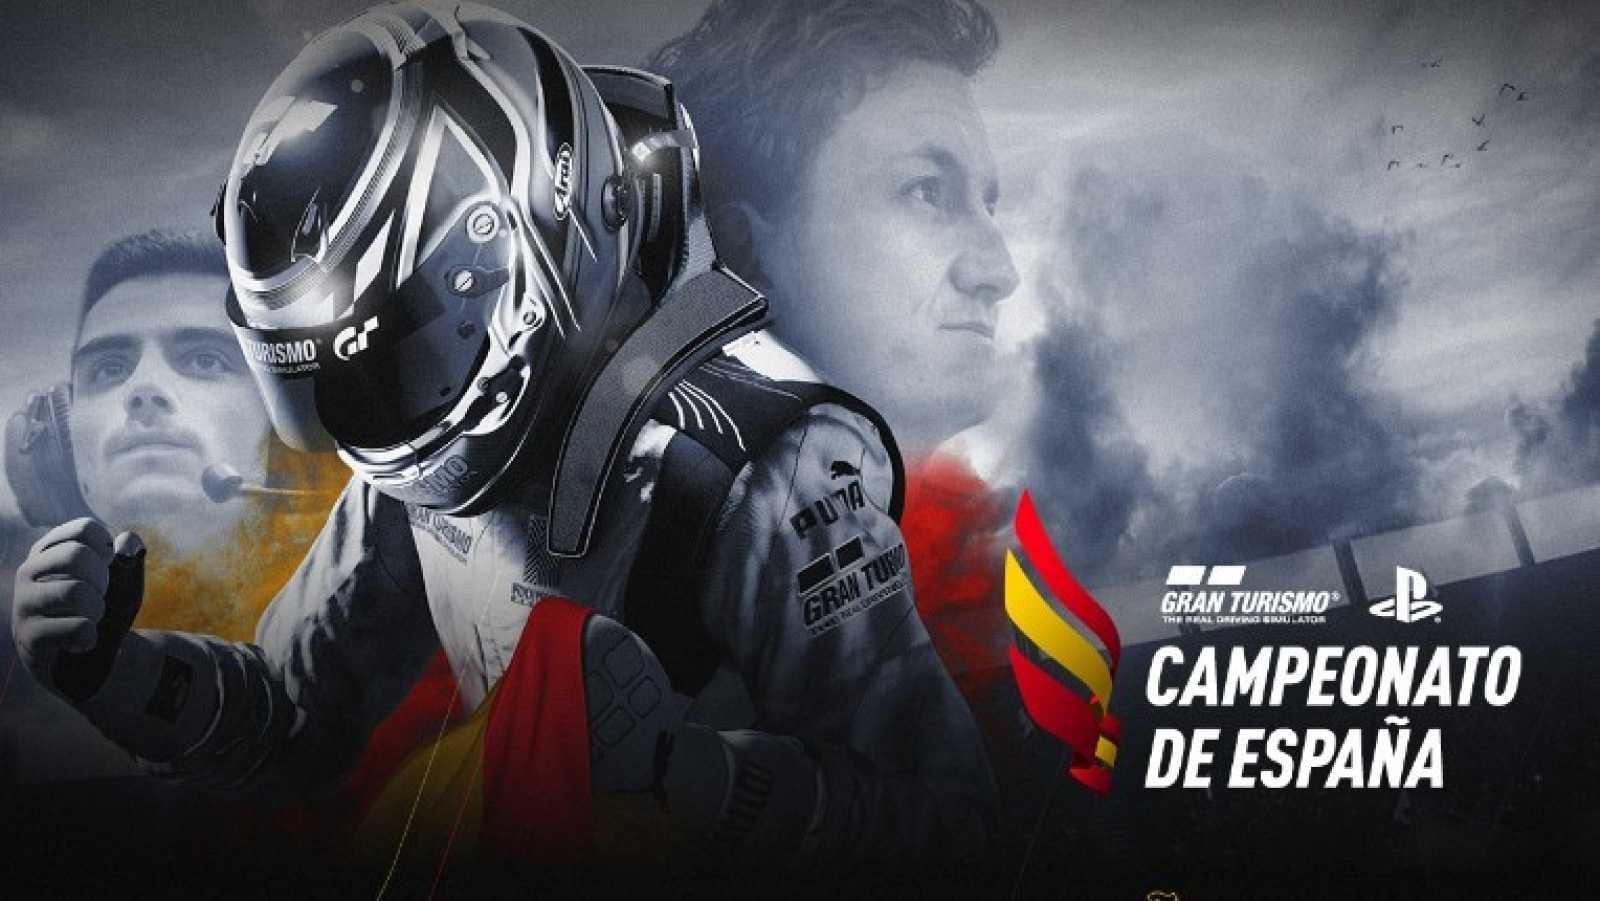 Primer campeonato de España de Gran Turismo